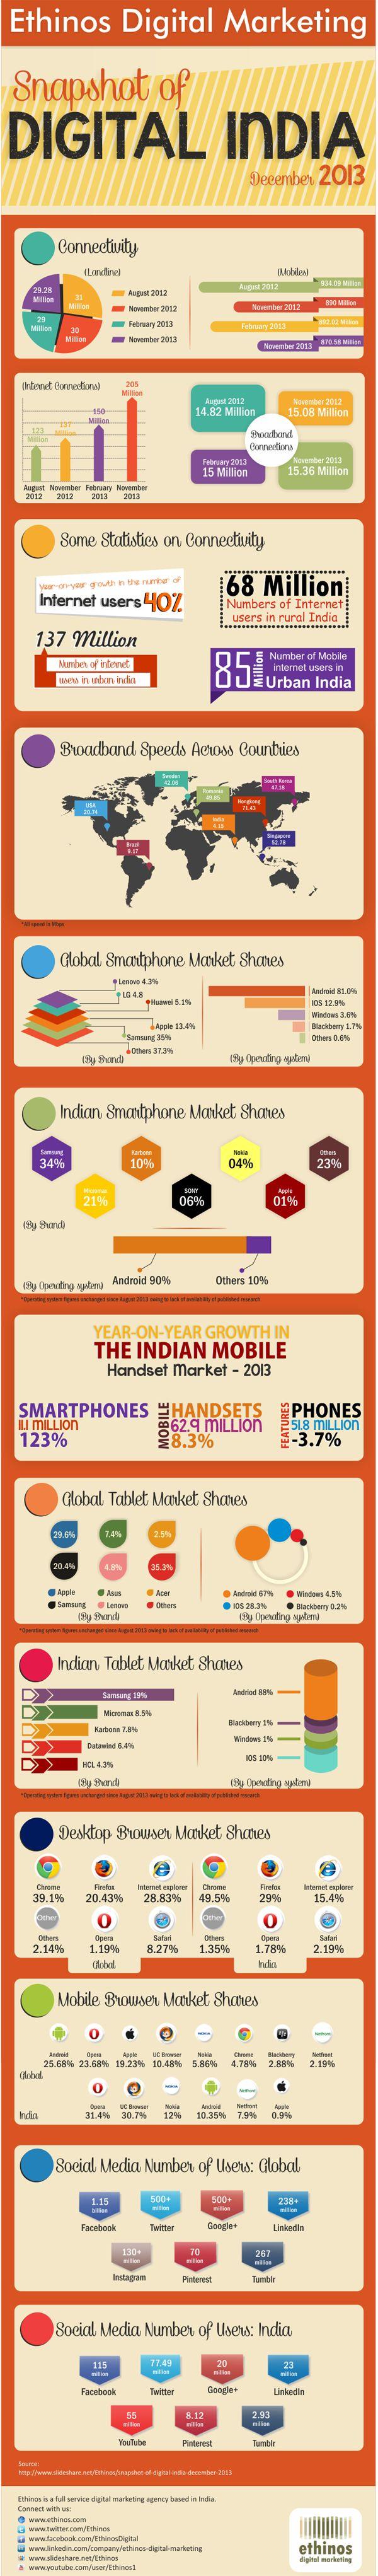 Digital India: Social Media, Desktop, Tablet, Smartphone Usage [INFOGRAPHIC] #socialmedia